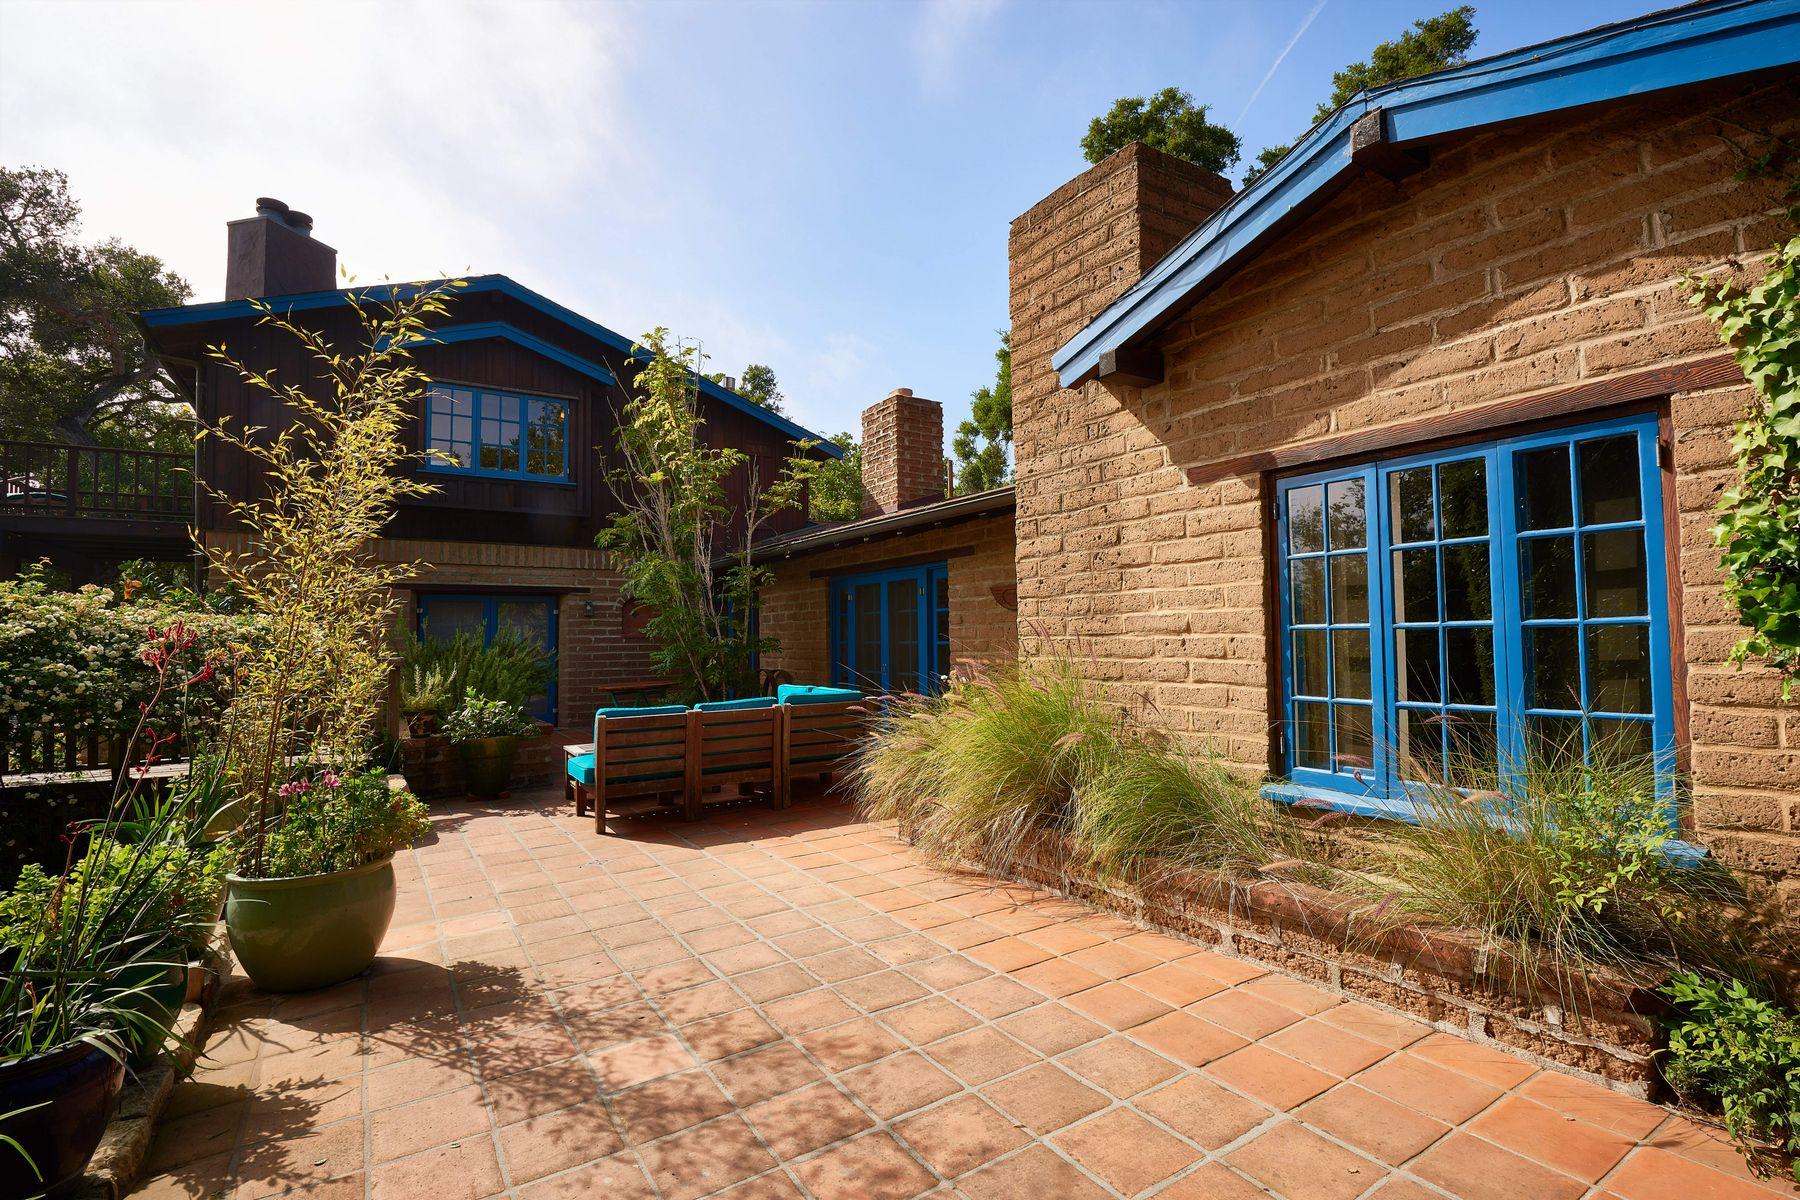 Property for Sale at Beautiful Adobe in Rural Montecito 2942 Torito Road Santa Barbara, California 93108 United States